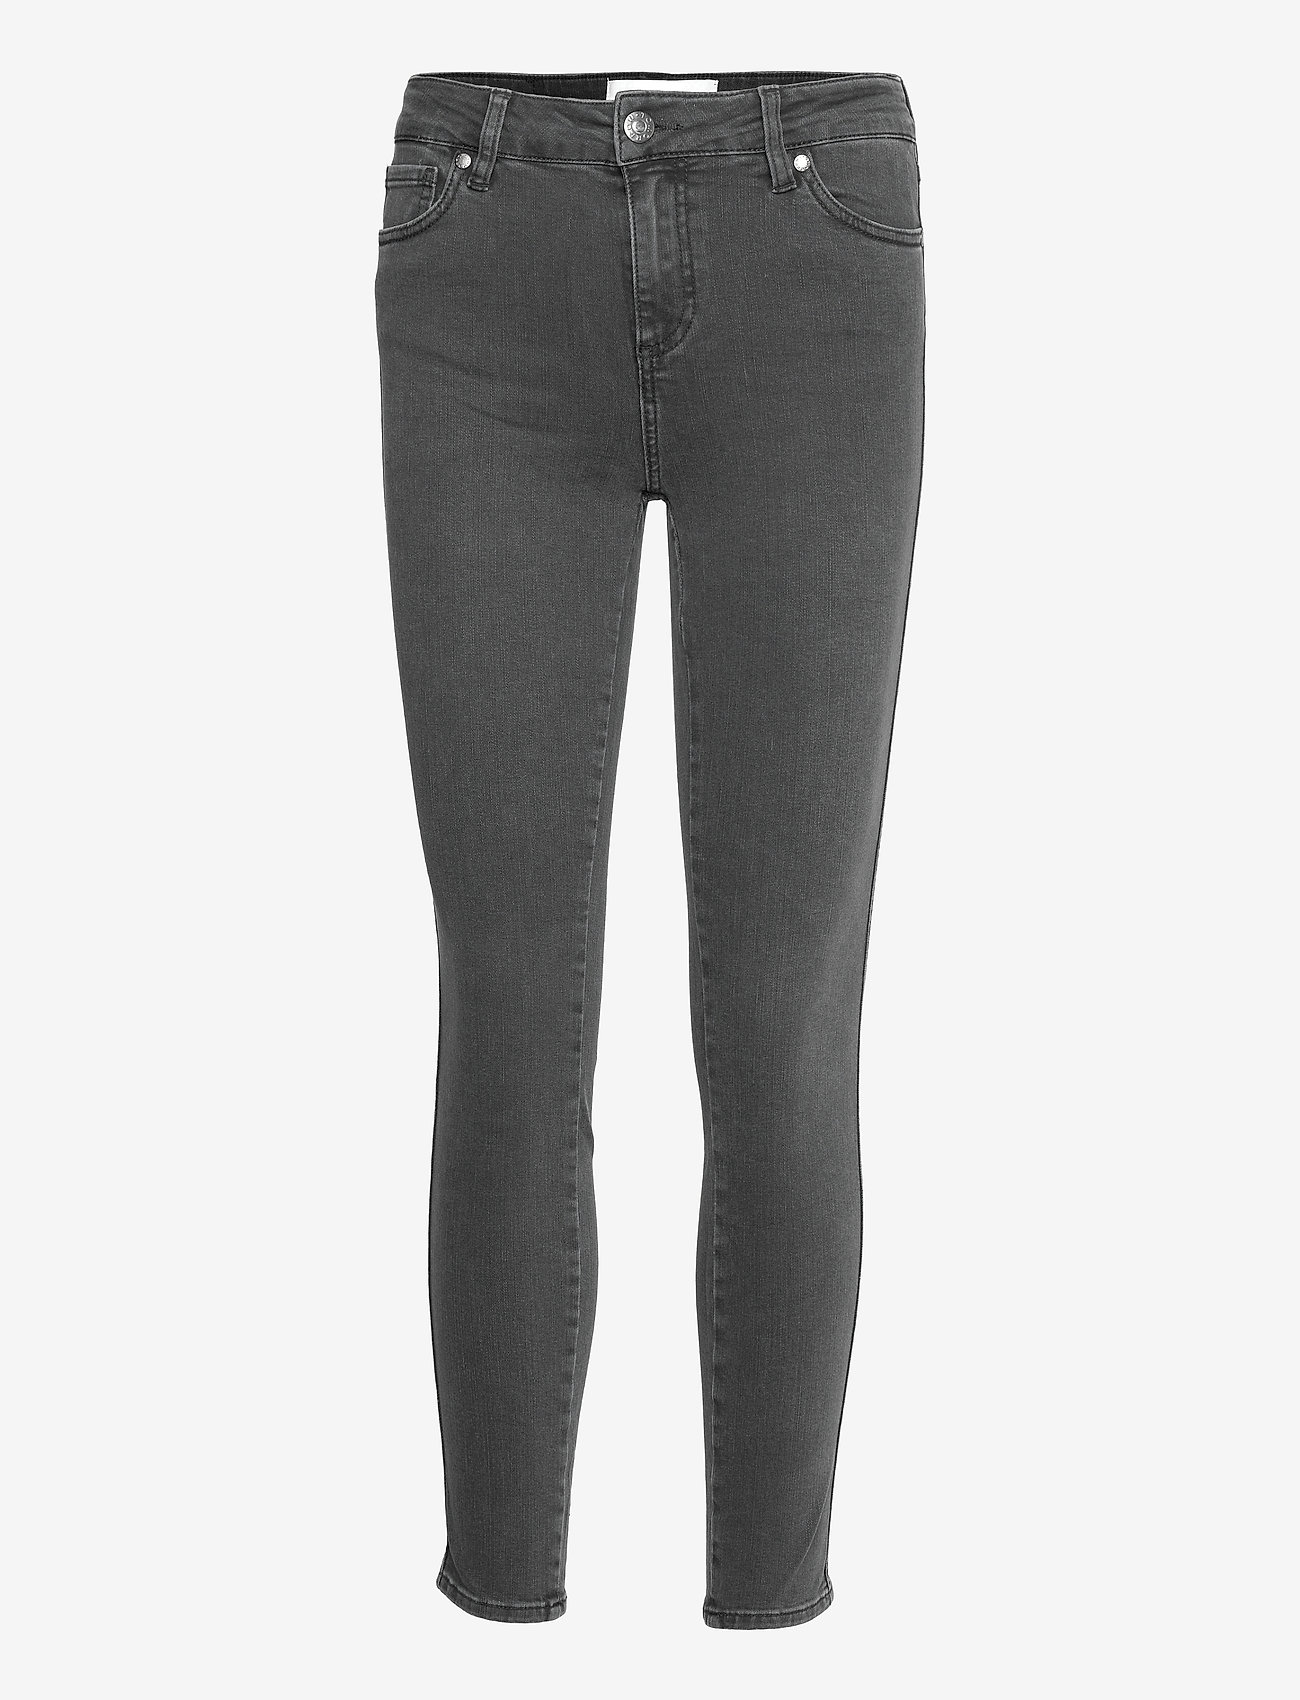 Tomorrow - Dylan MW cropped charcoal grey - skinny jeans - grey - 0